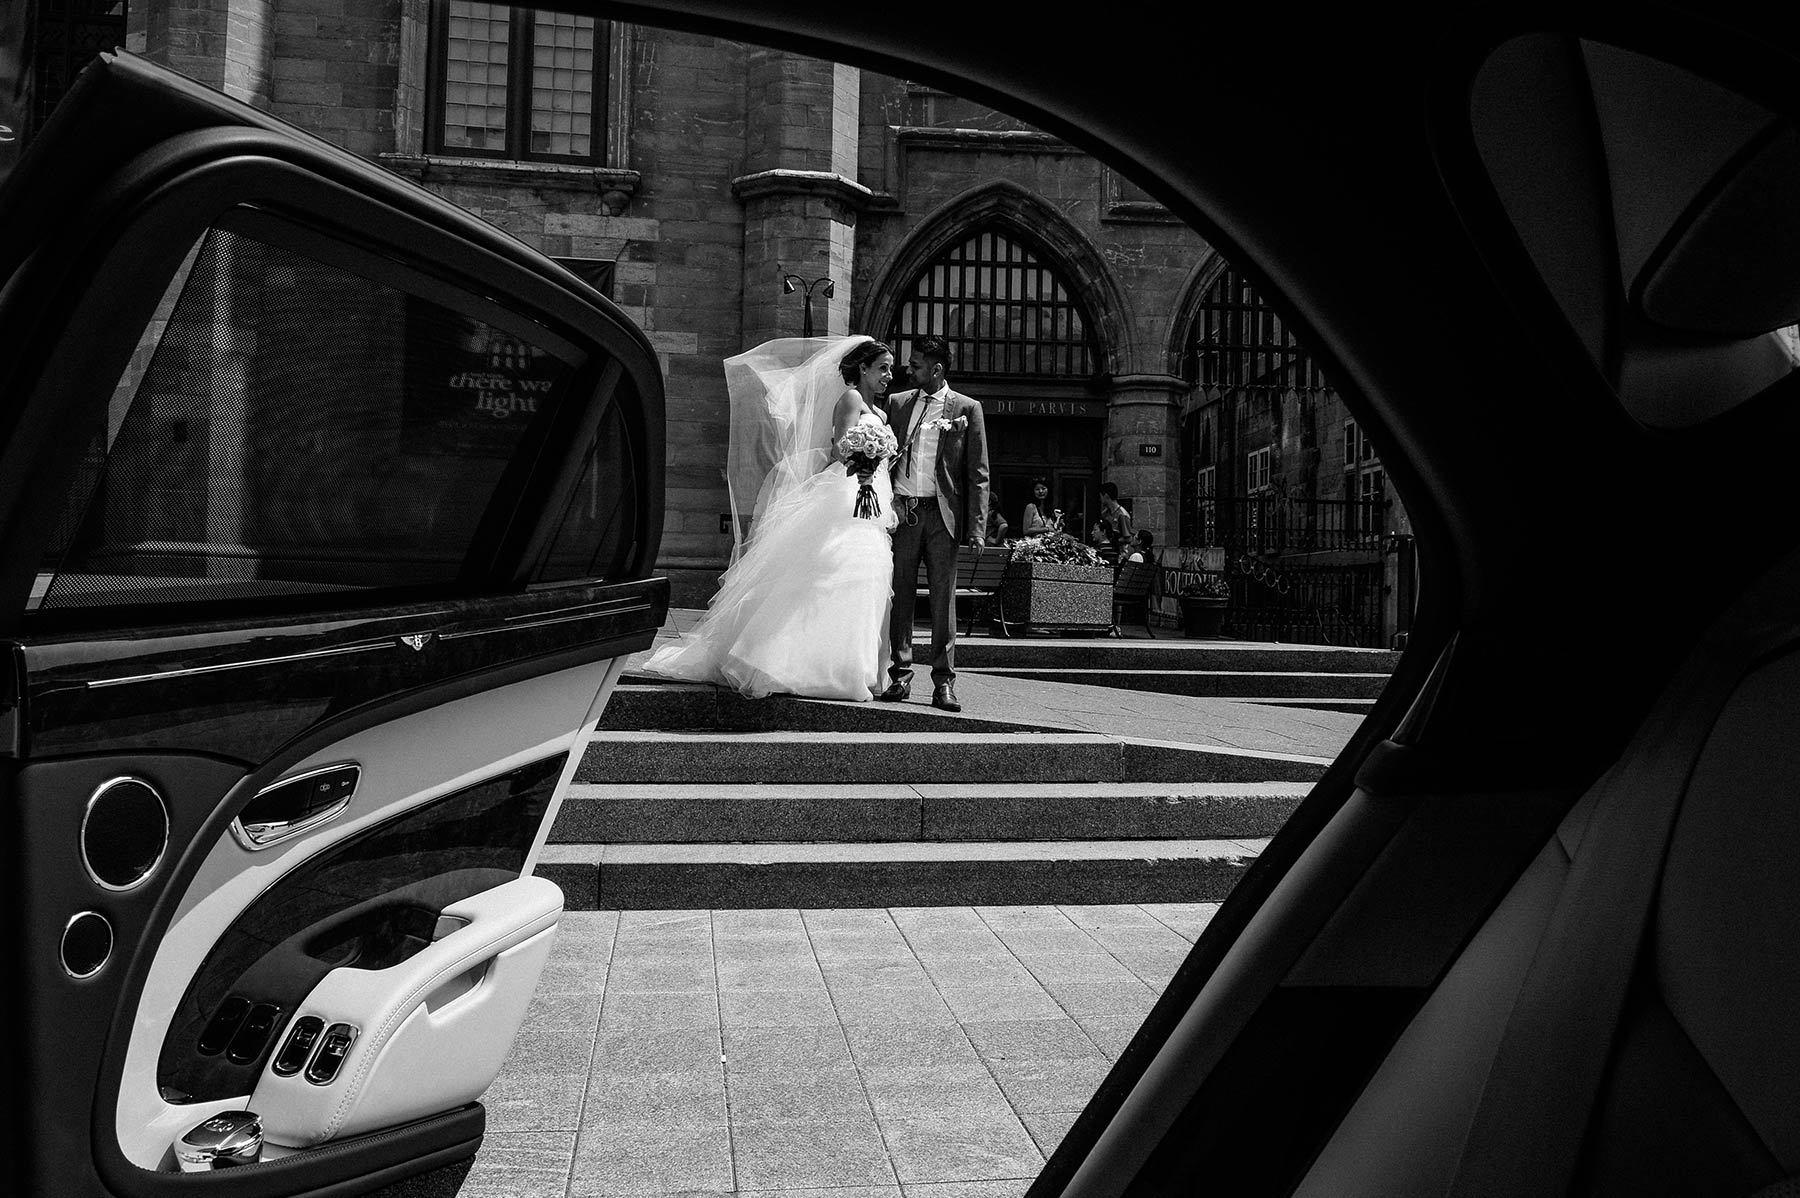 Montreal wedding photographer, bride and groom